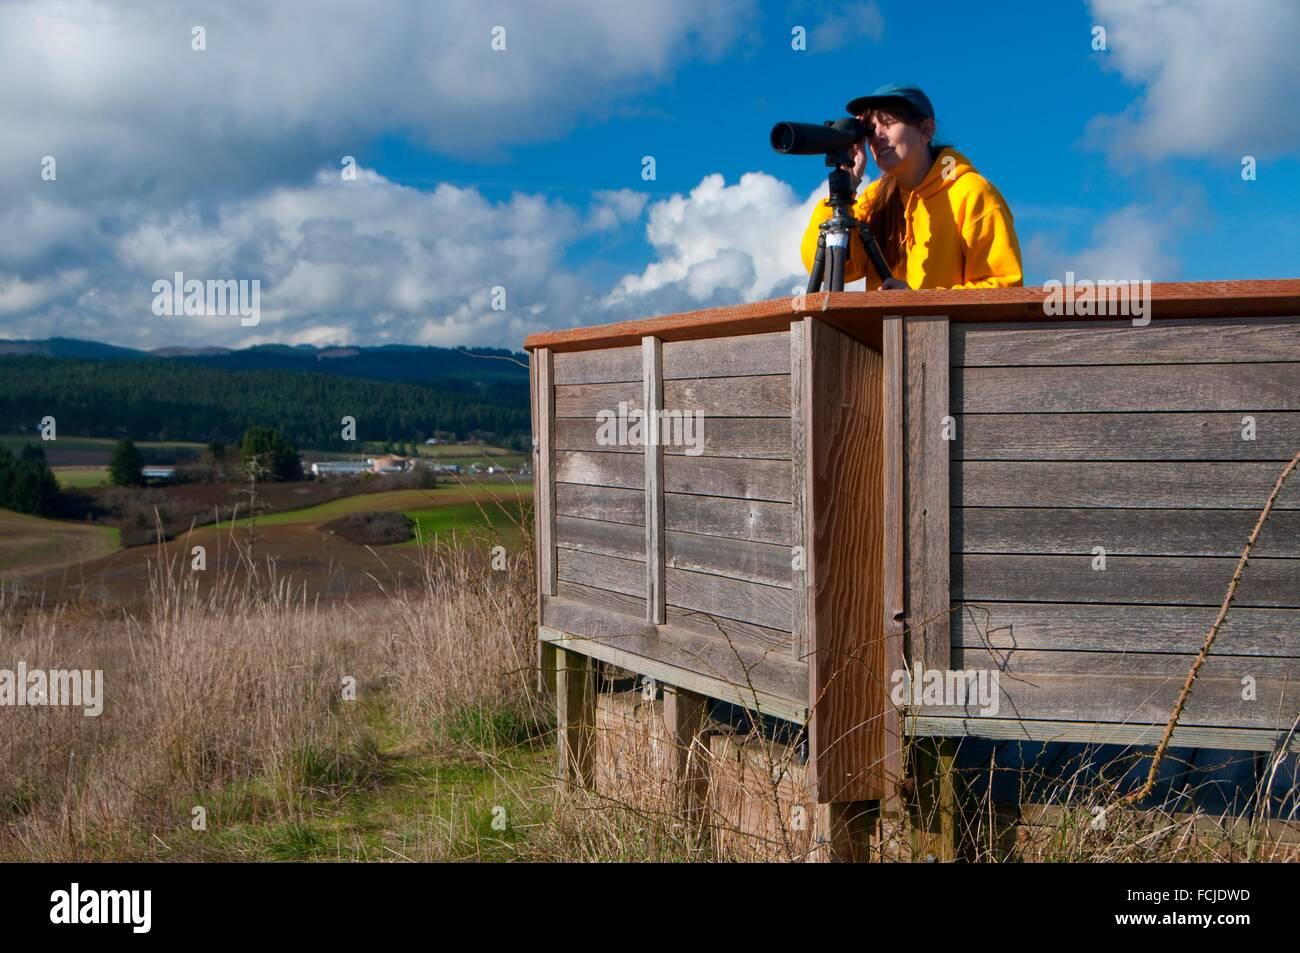 Birding with spotting scope on Baskett Butte, Baskett Slough National Wildlife Refuge, Oregon. - Stock Image